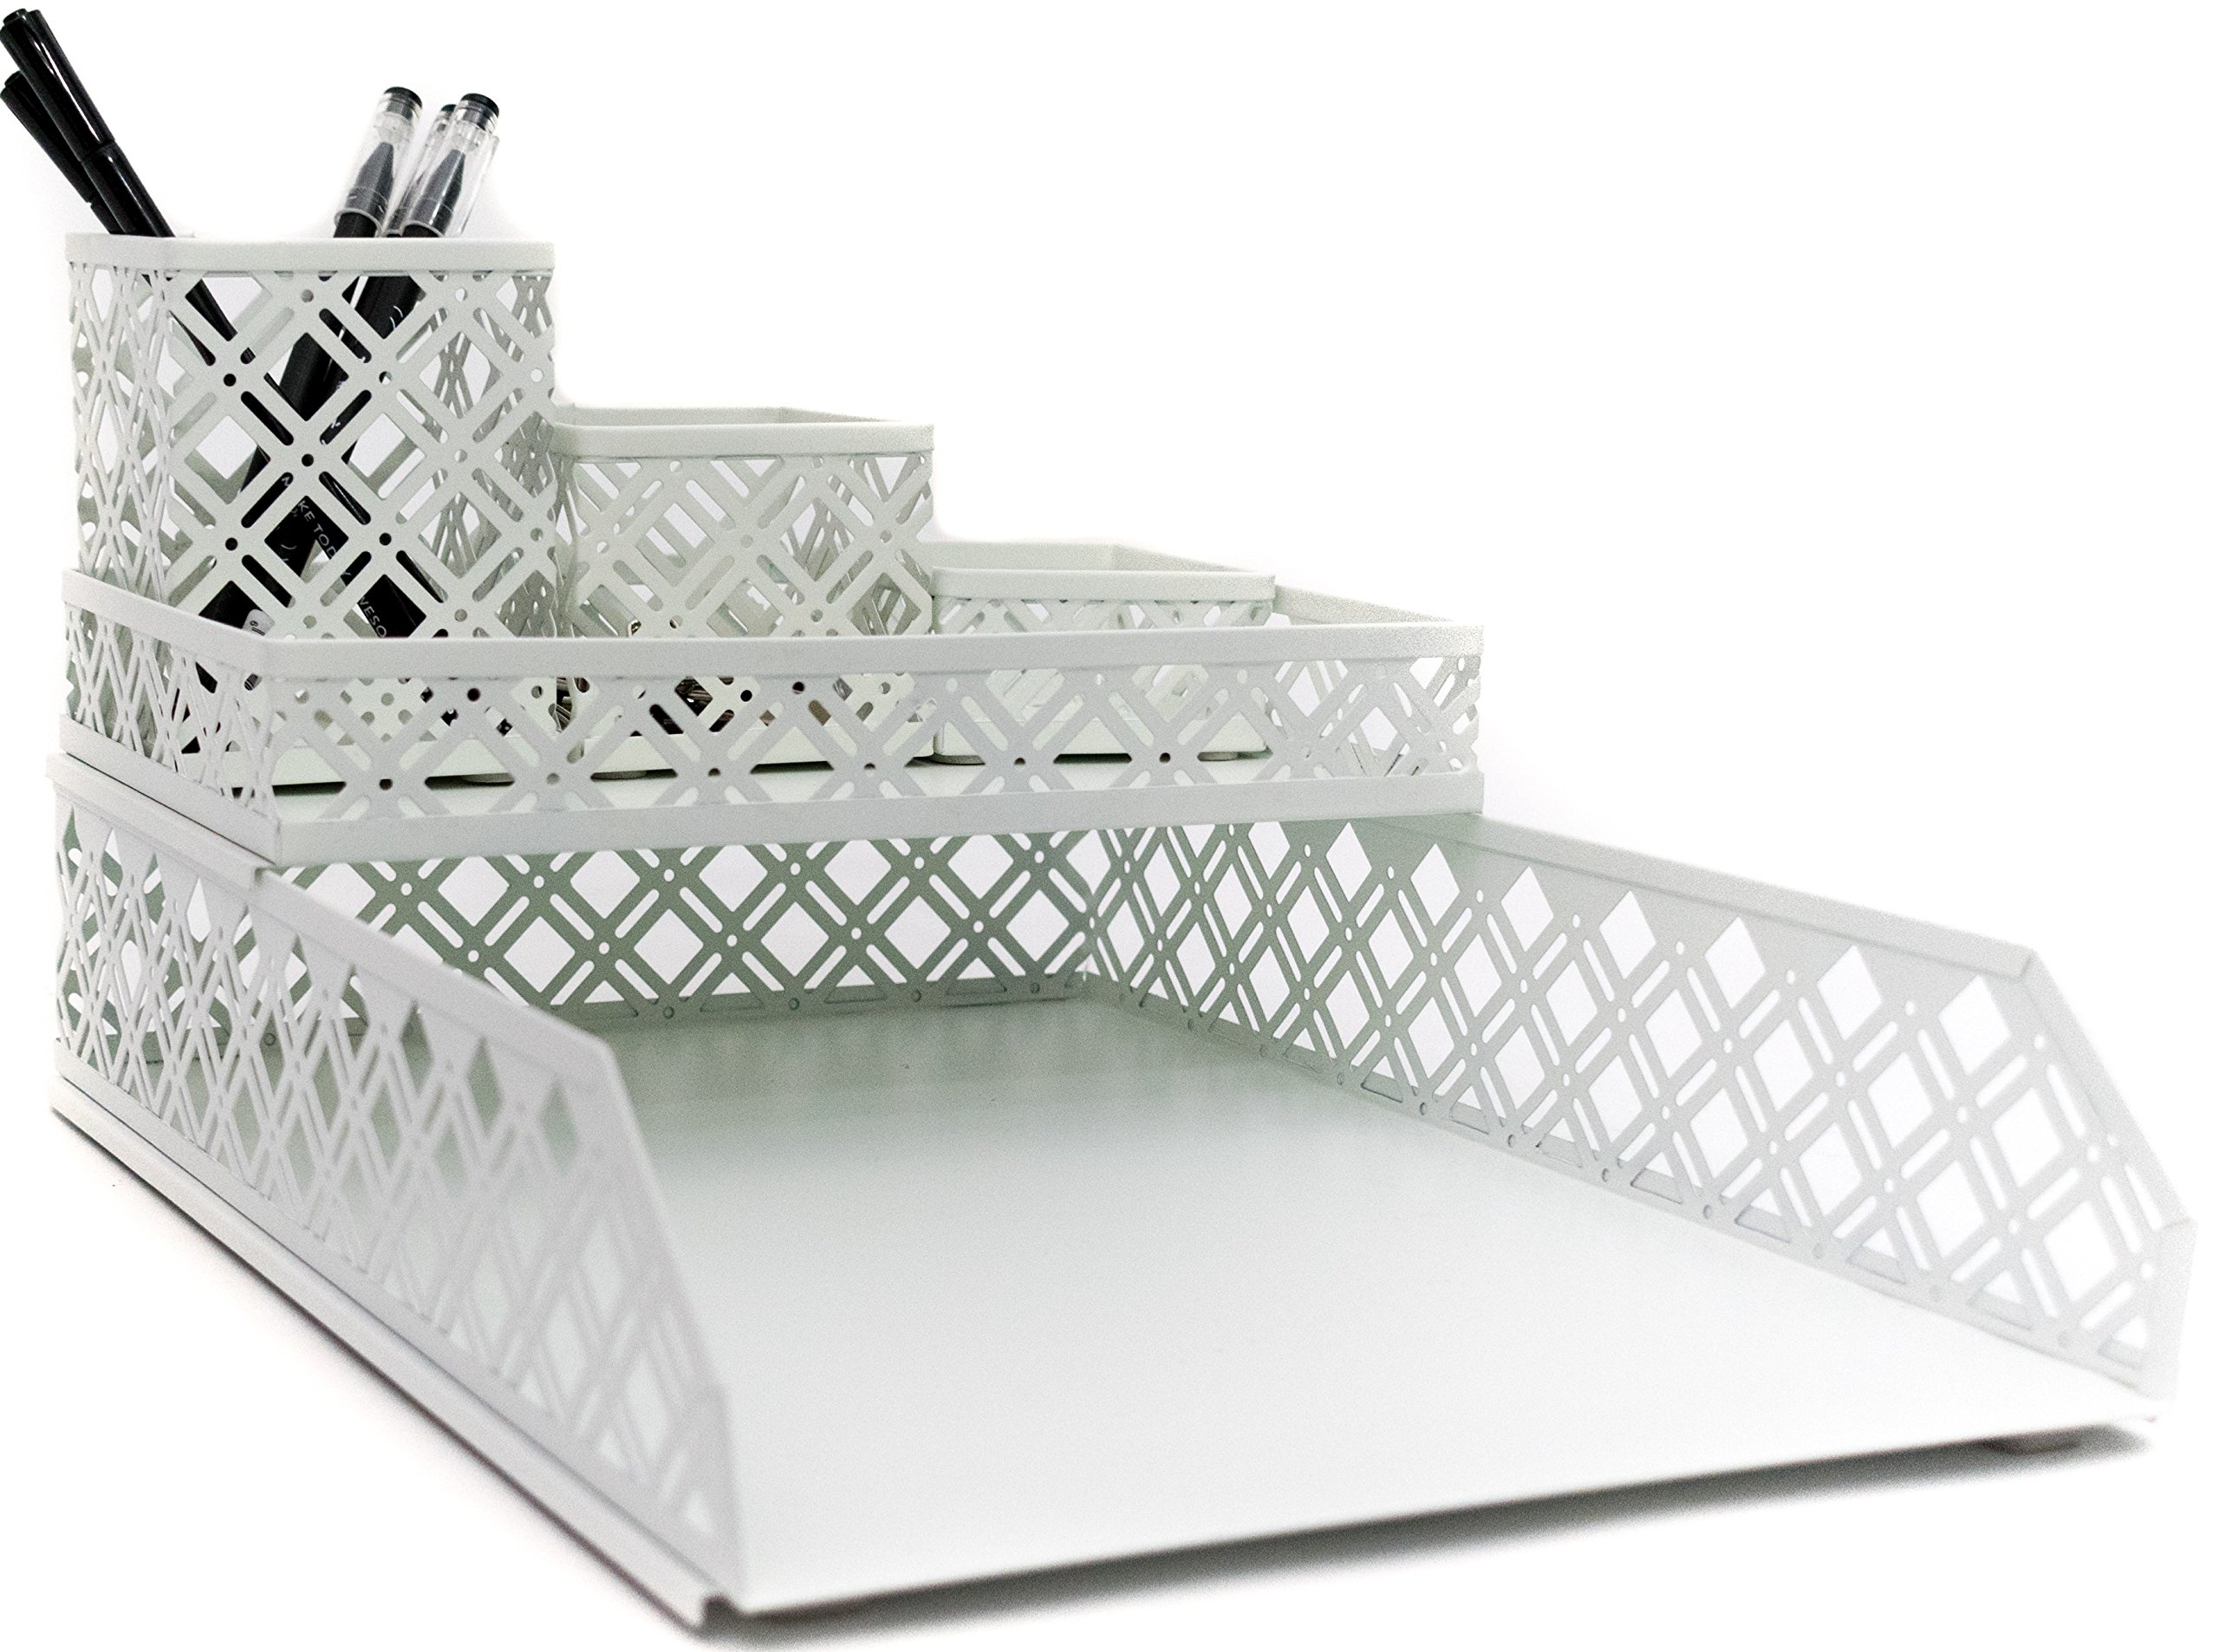 Blu Monaco White Desk Organizer - 5 Piece Interlocking Desk Accessories Set - Paper - Document Tray, Pen Cup, 3 Assorted Accessory Trays